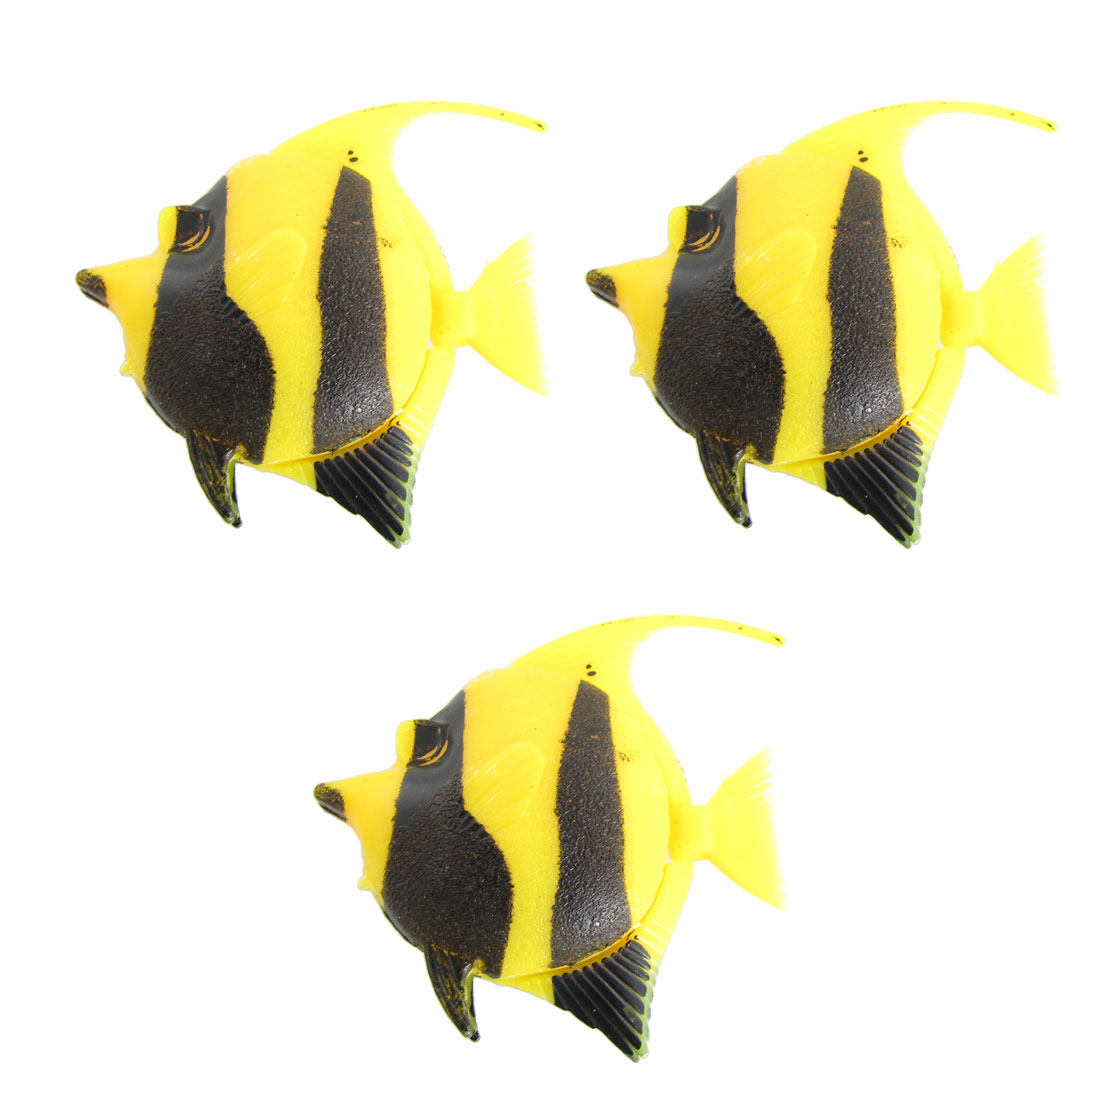 3 Pcs Yellow Black Plastic Floating Tail Fish for Aquarium Fish Tank